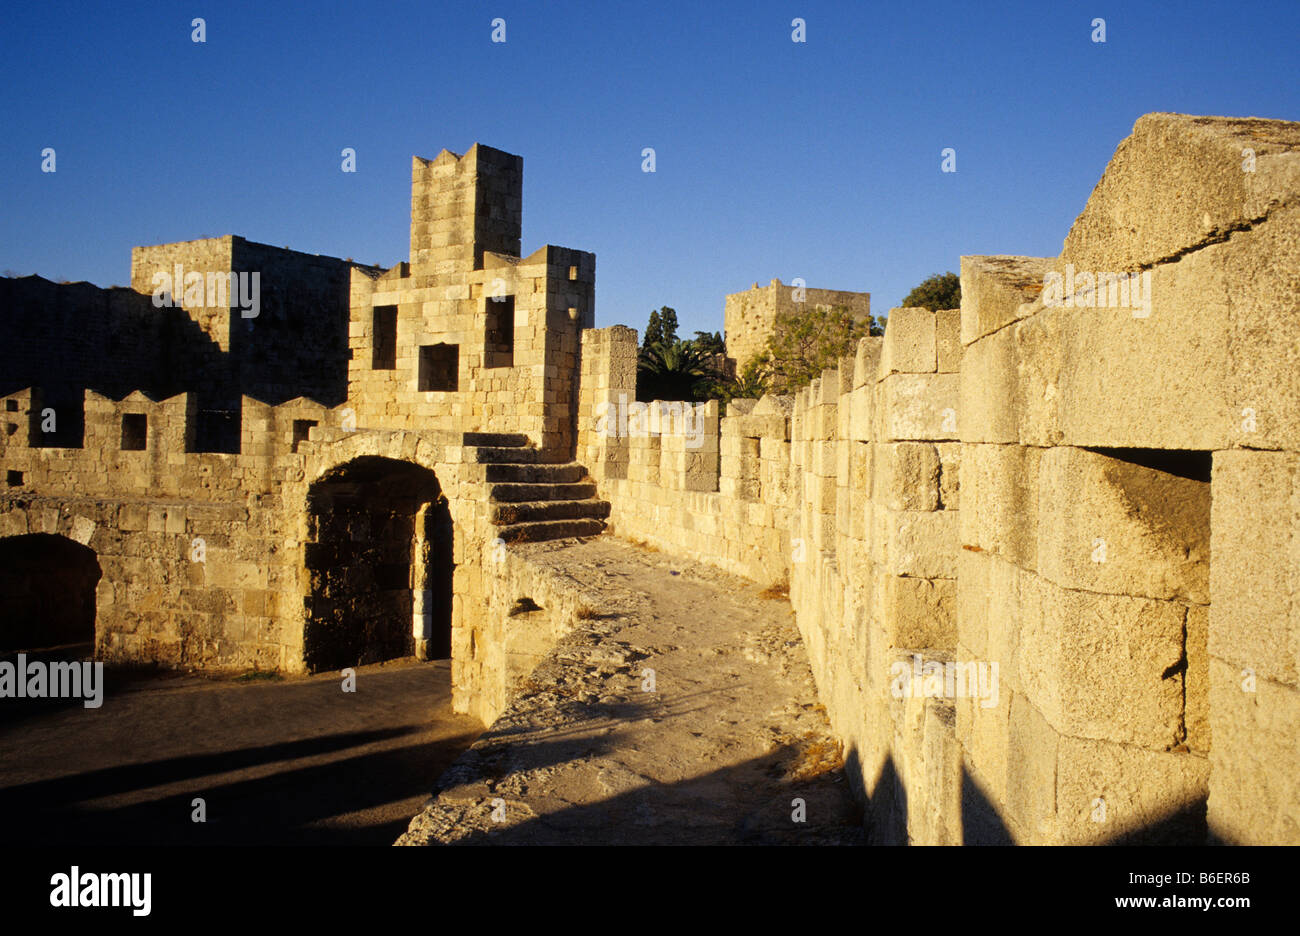 City wall, Rhodes City, Rhodes Island, Greece, Europe Stock Photo